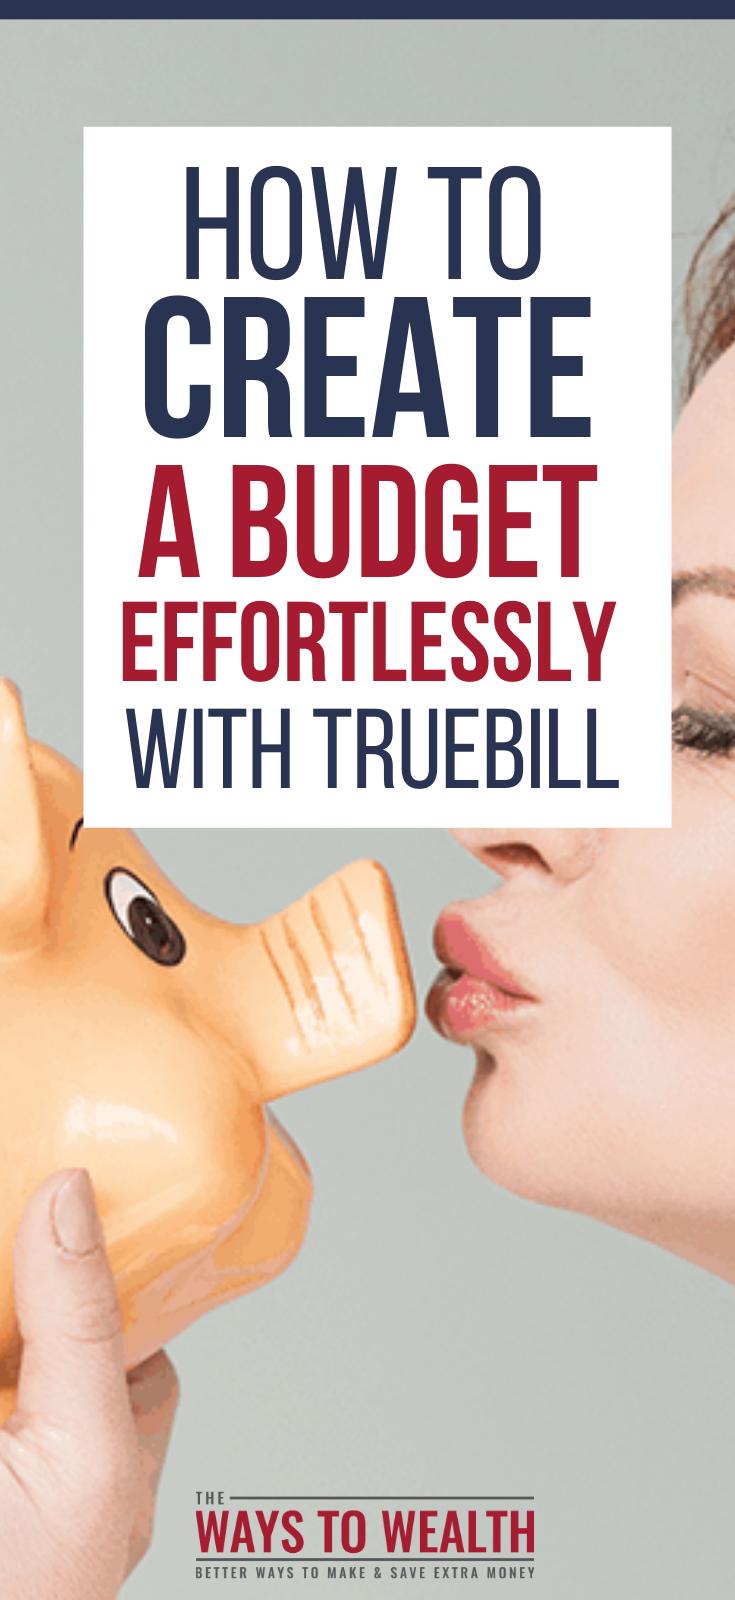 Truebill Review Can Truebill Save You Money, Effortlessly